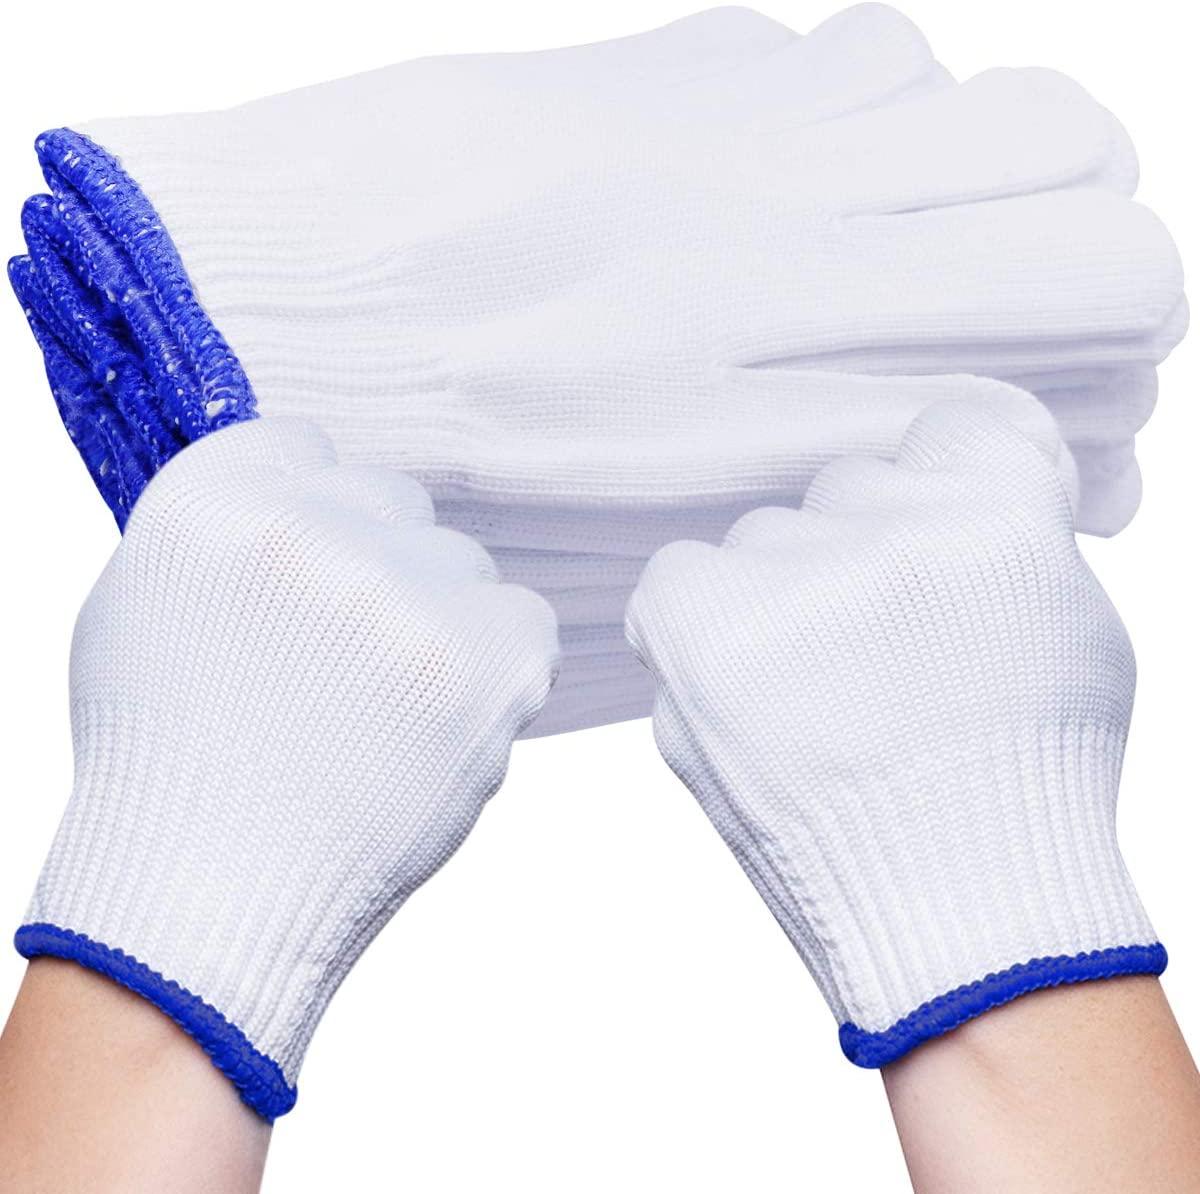 QY 5Pair Sturdy Labor Glove Thickened Cotton Gloves String Knit Gloves Work Gloves General Gloves White